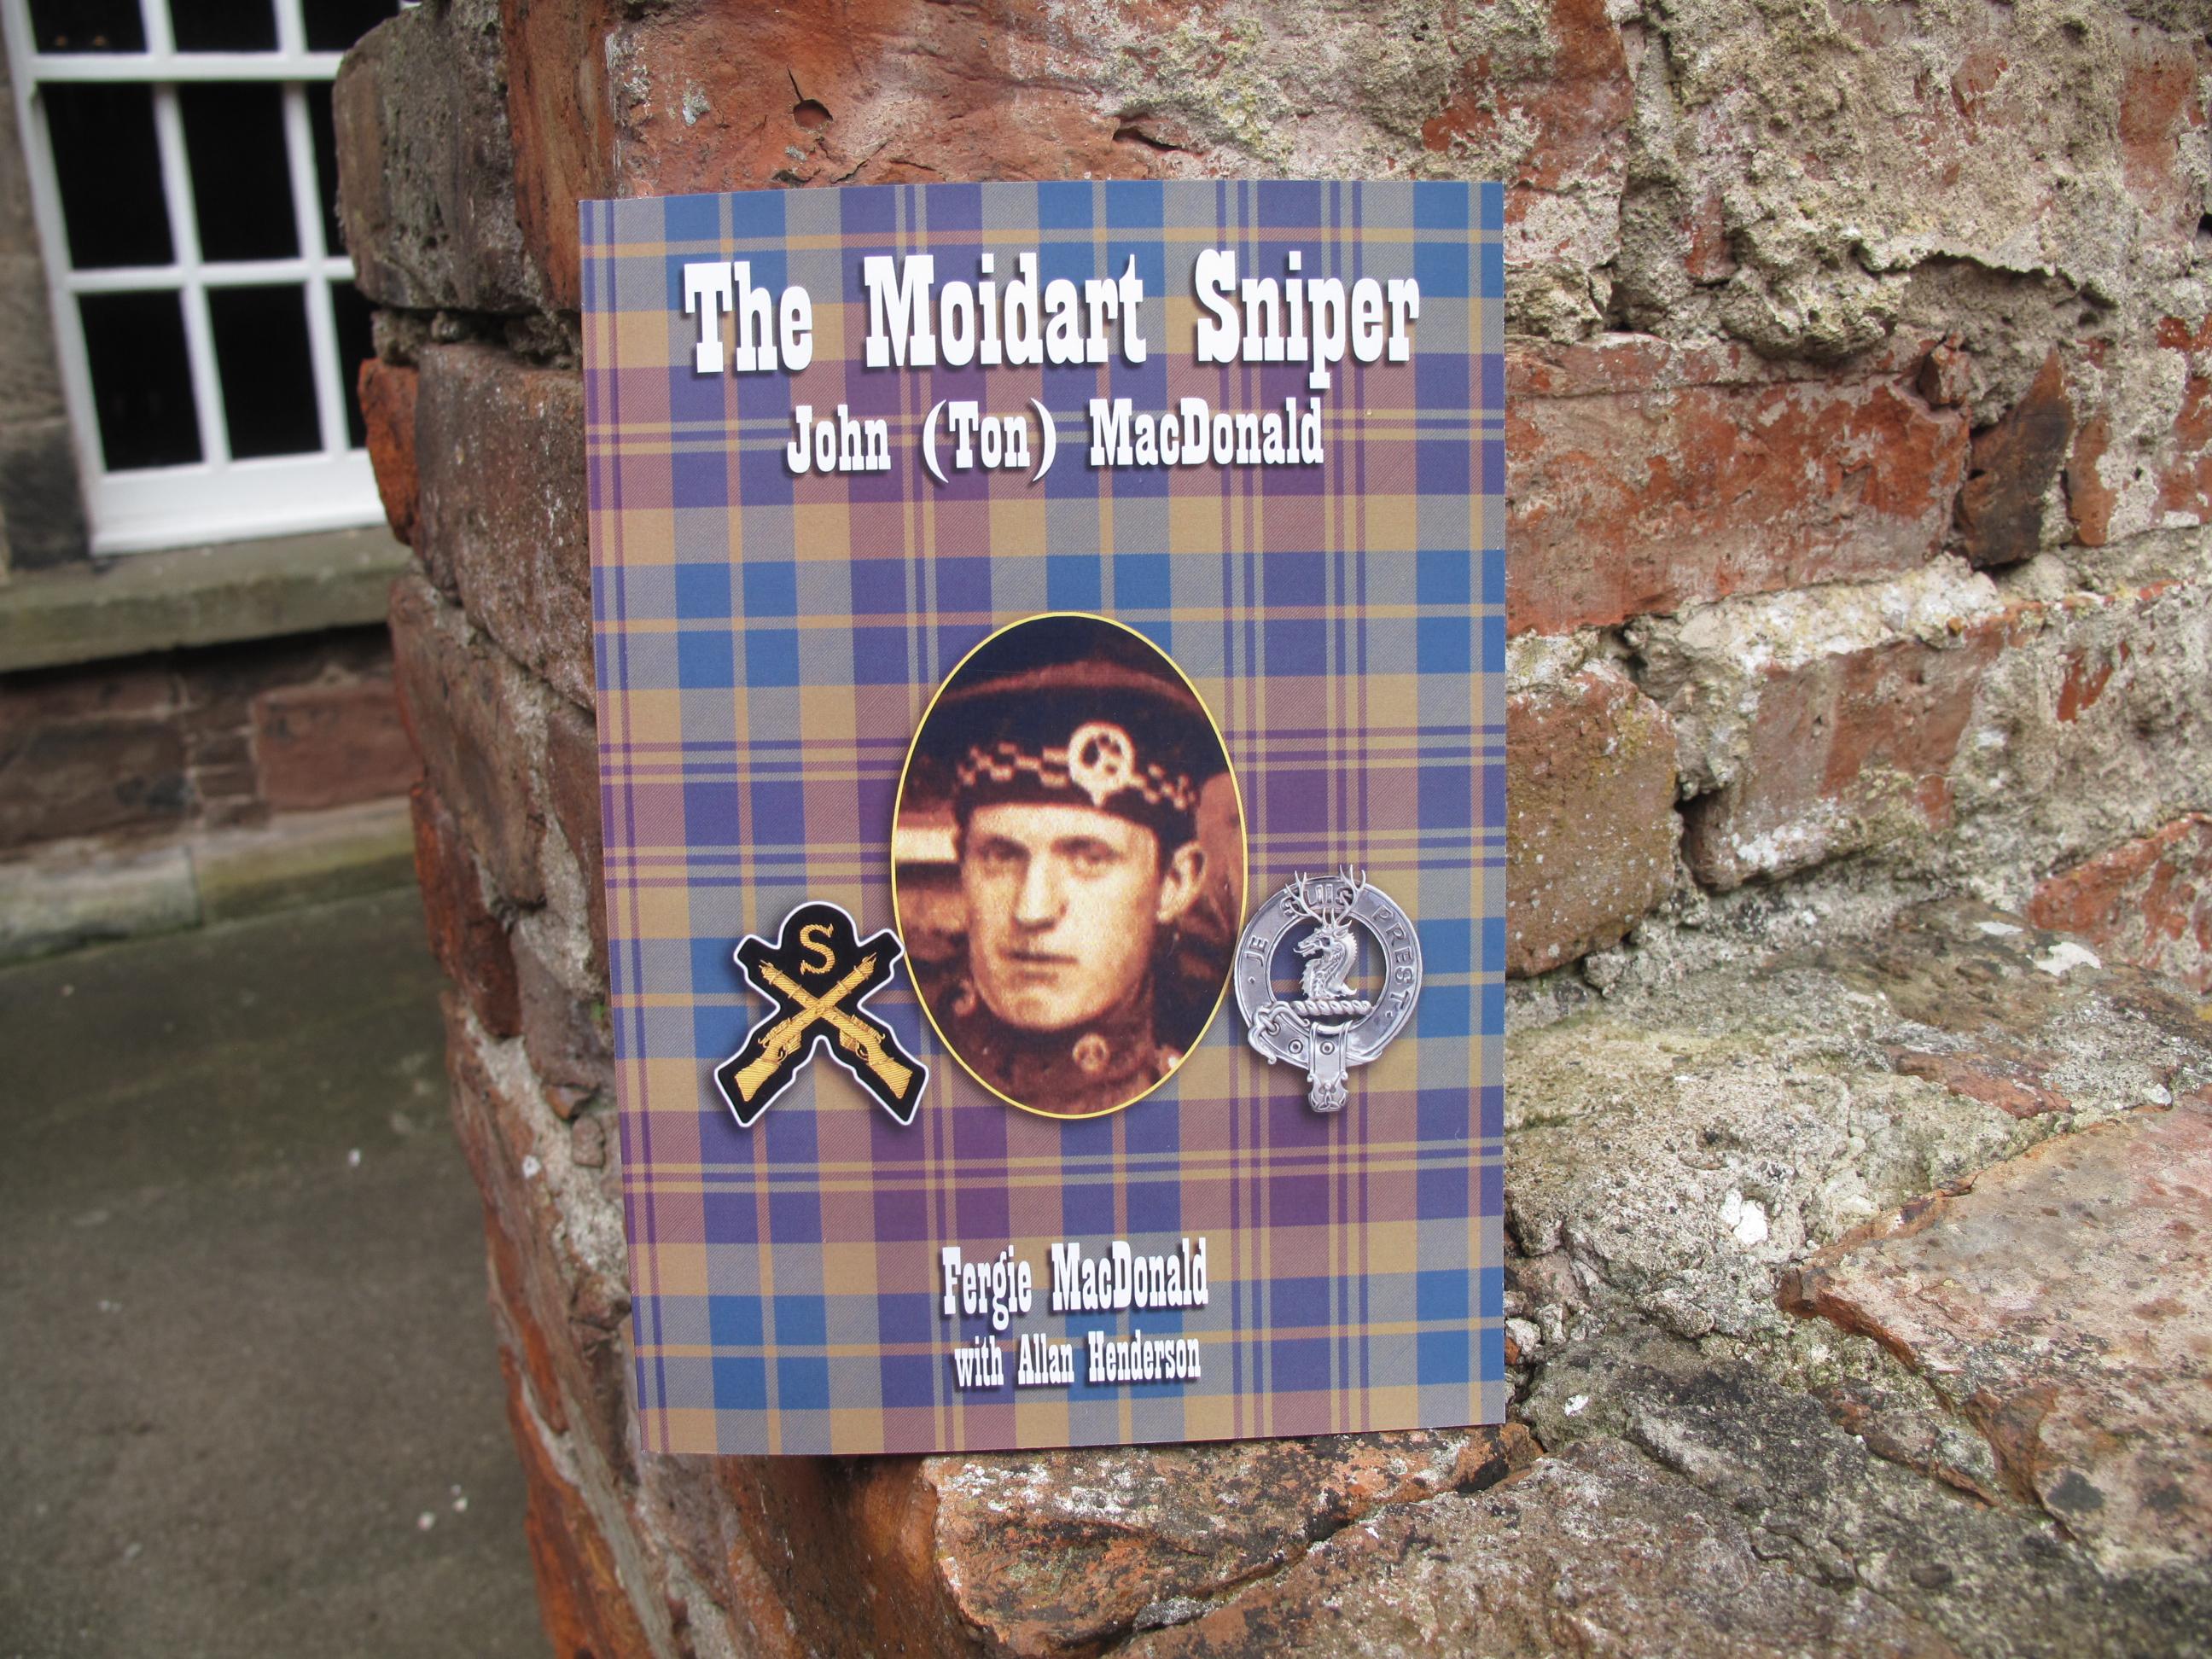 The Moidart Sniper